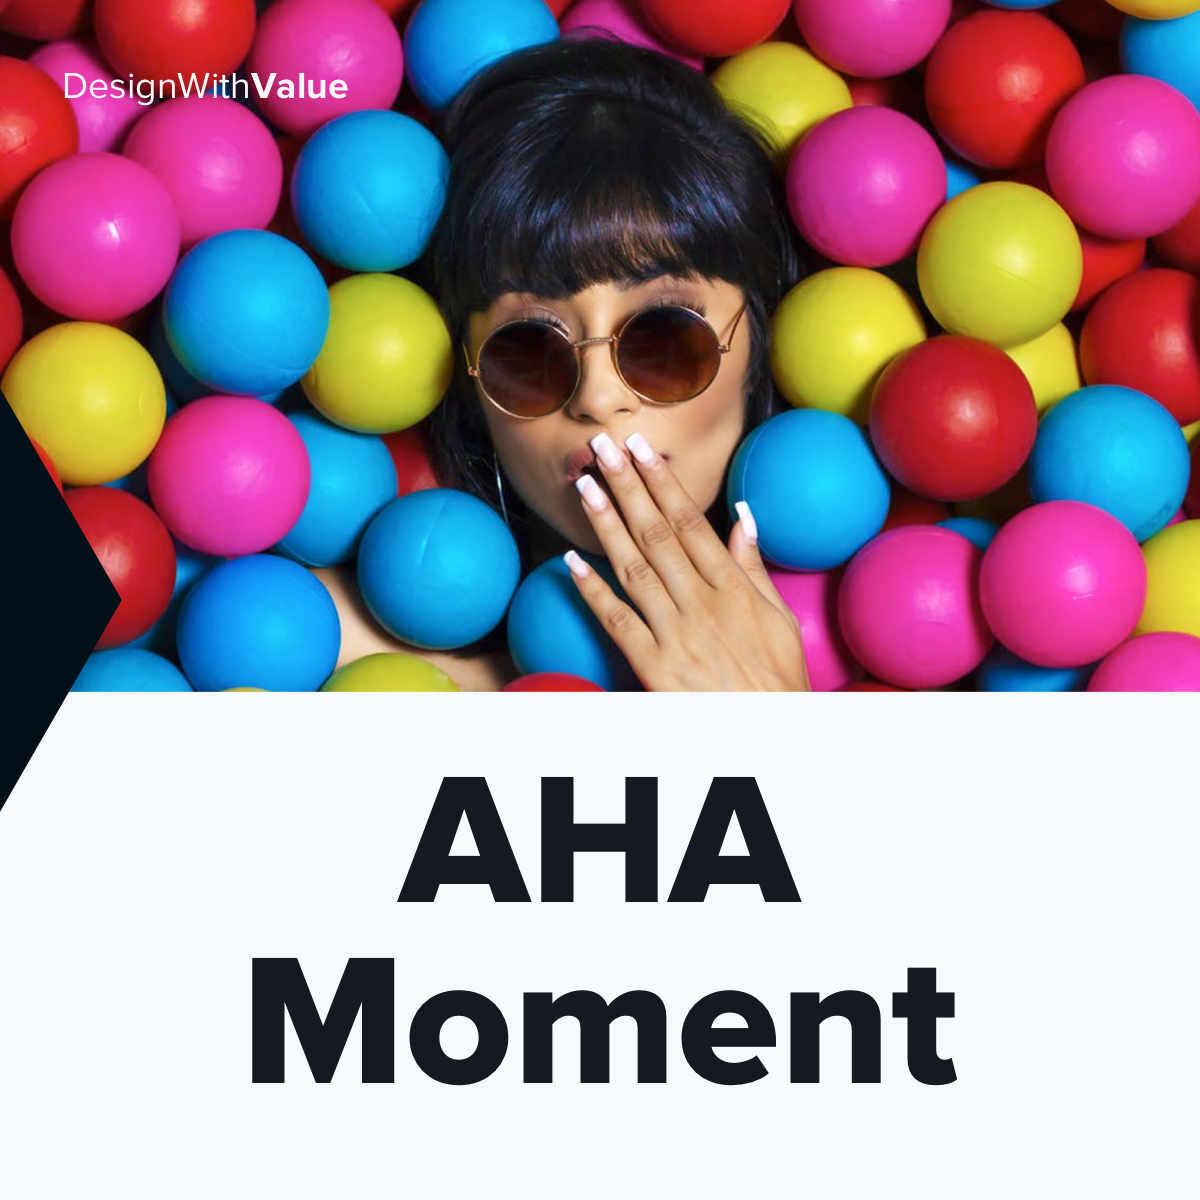 ...Aha moment